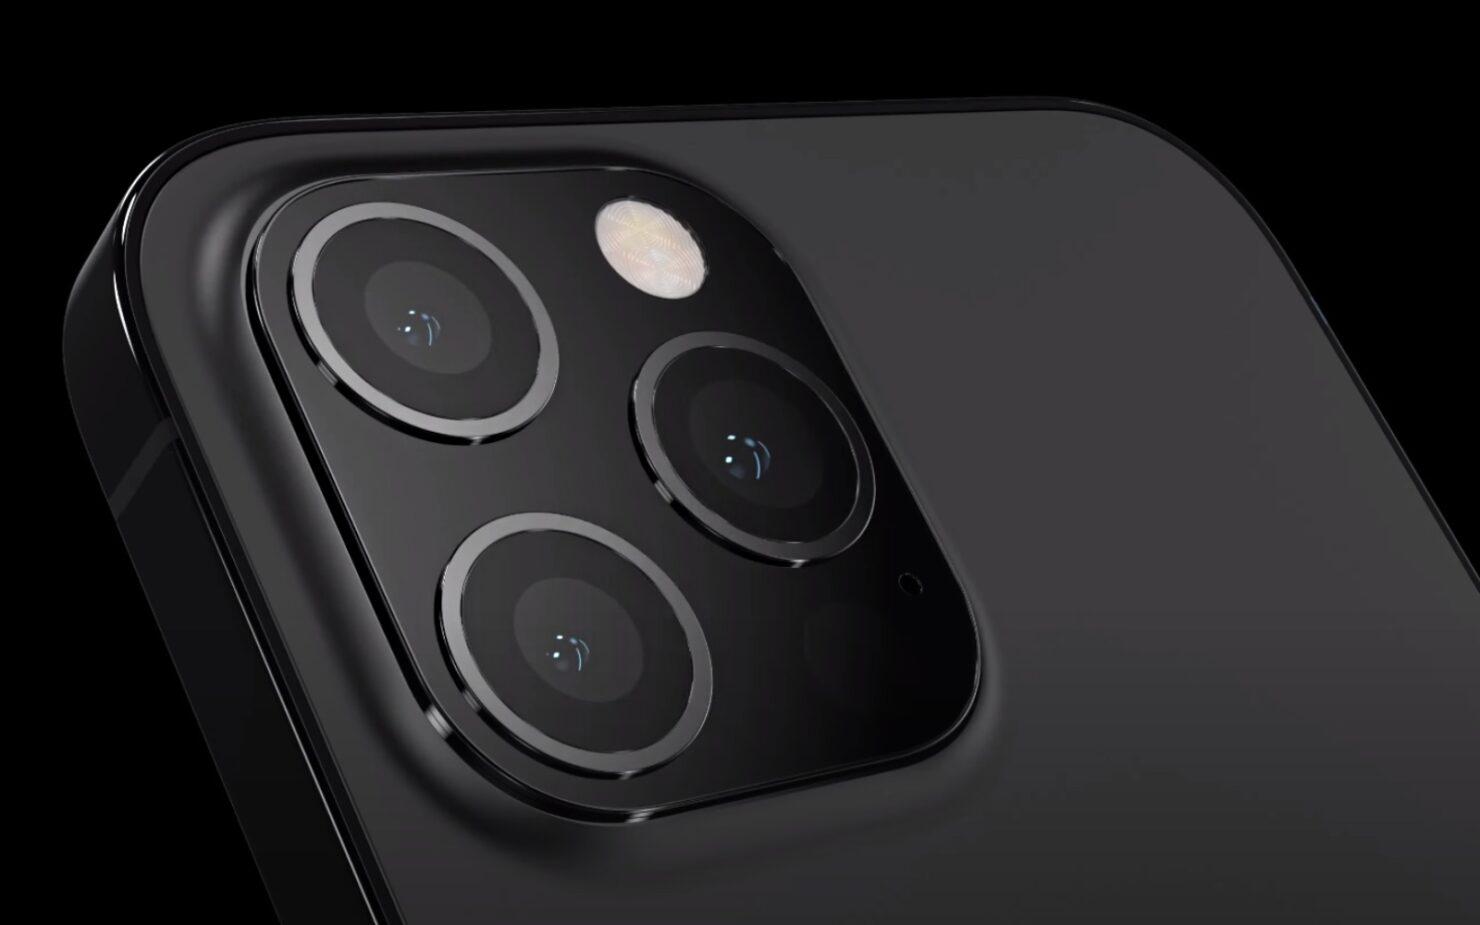 iPhone camera cost